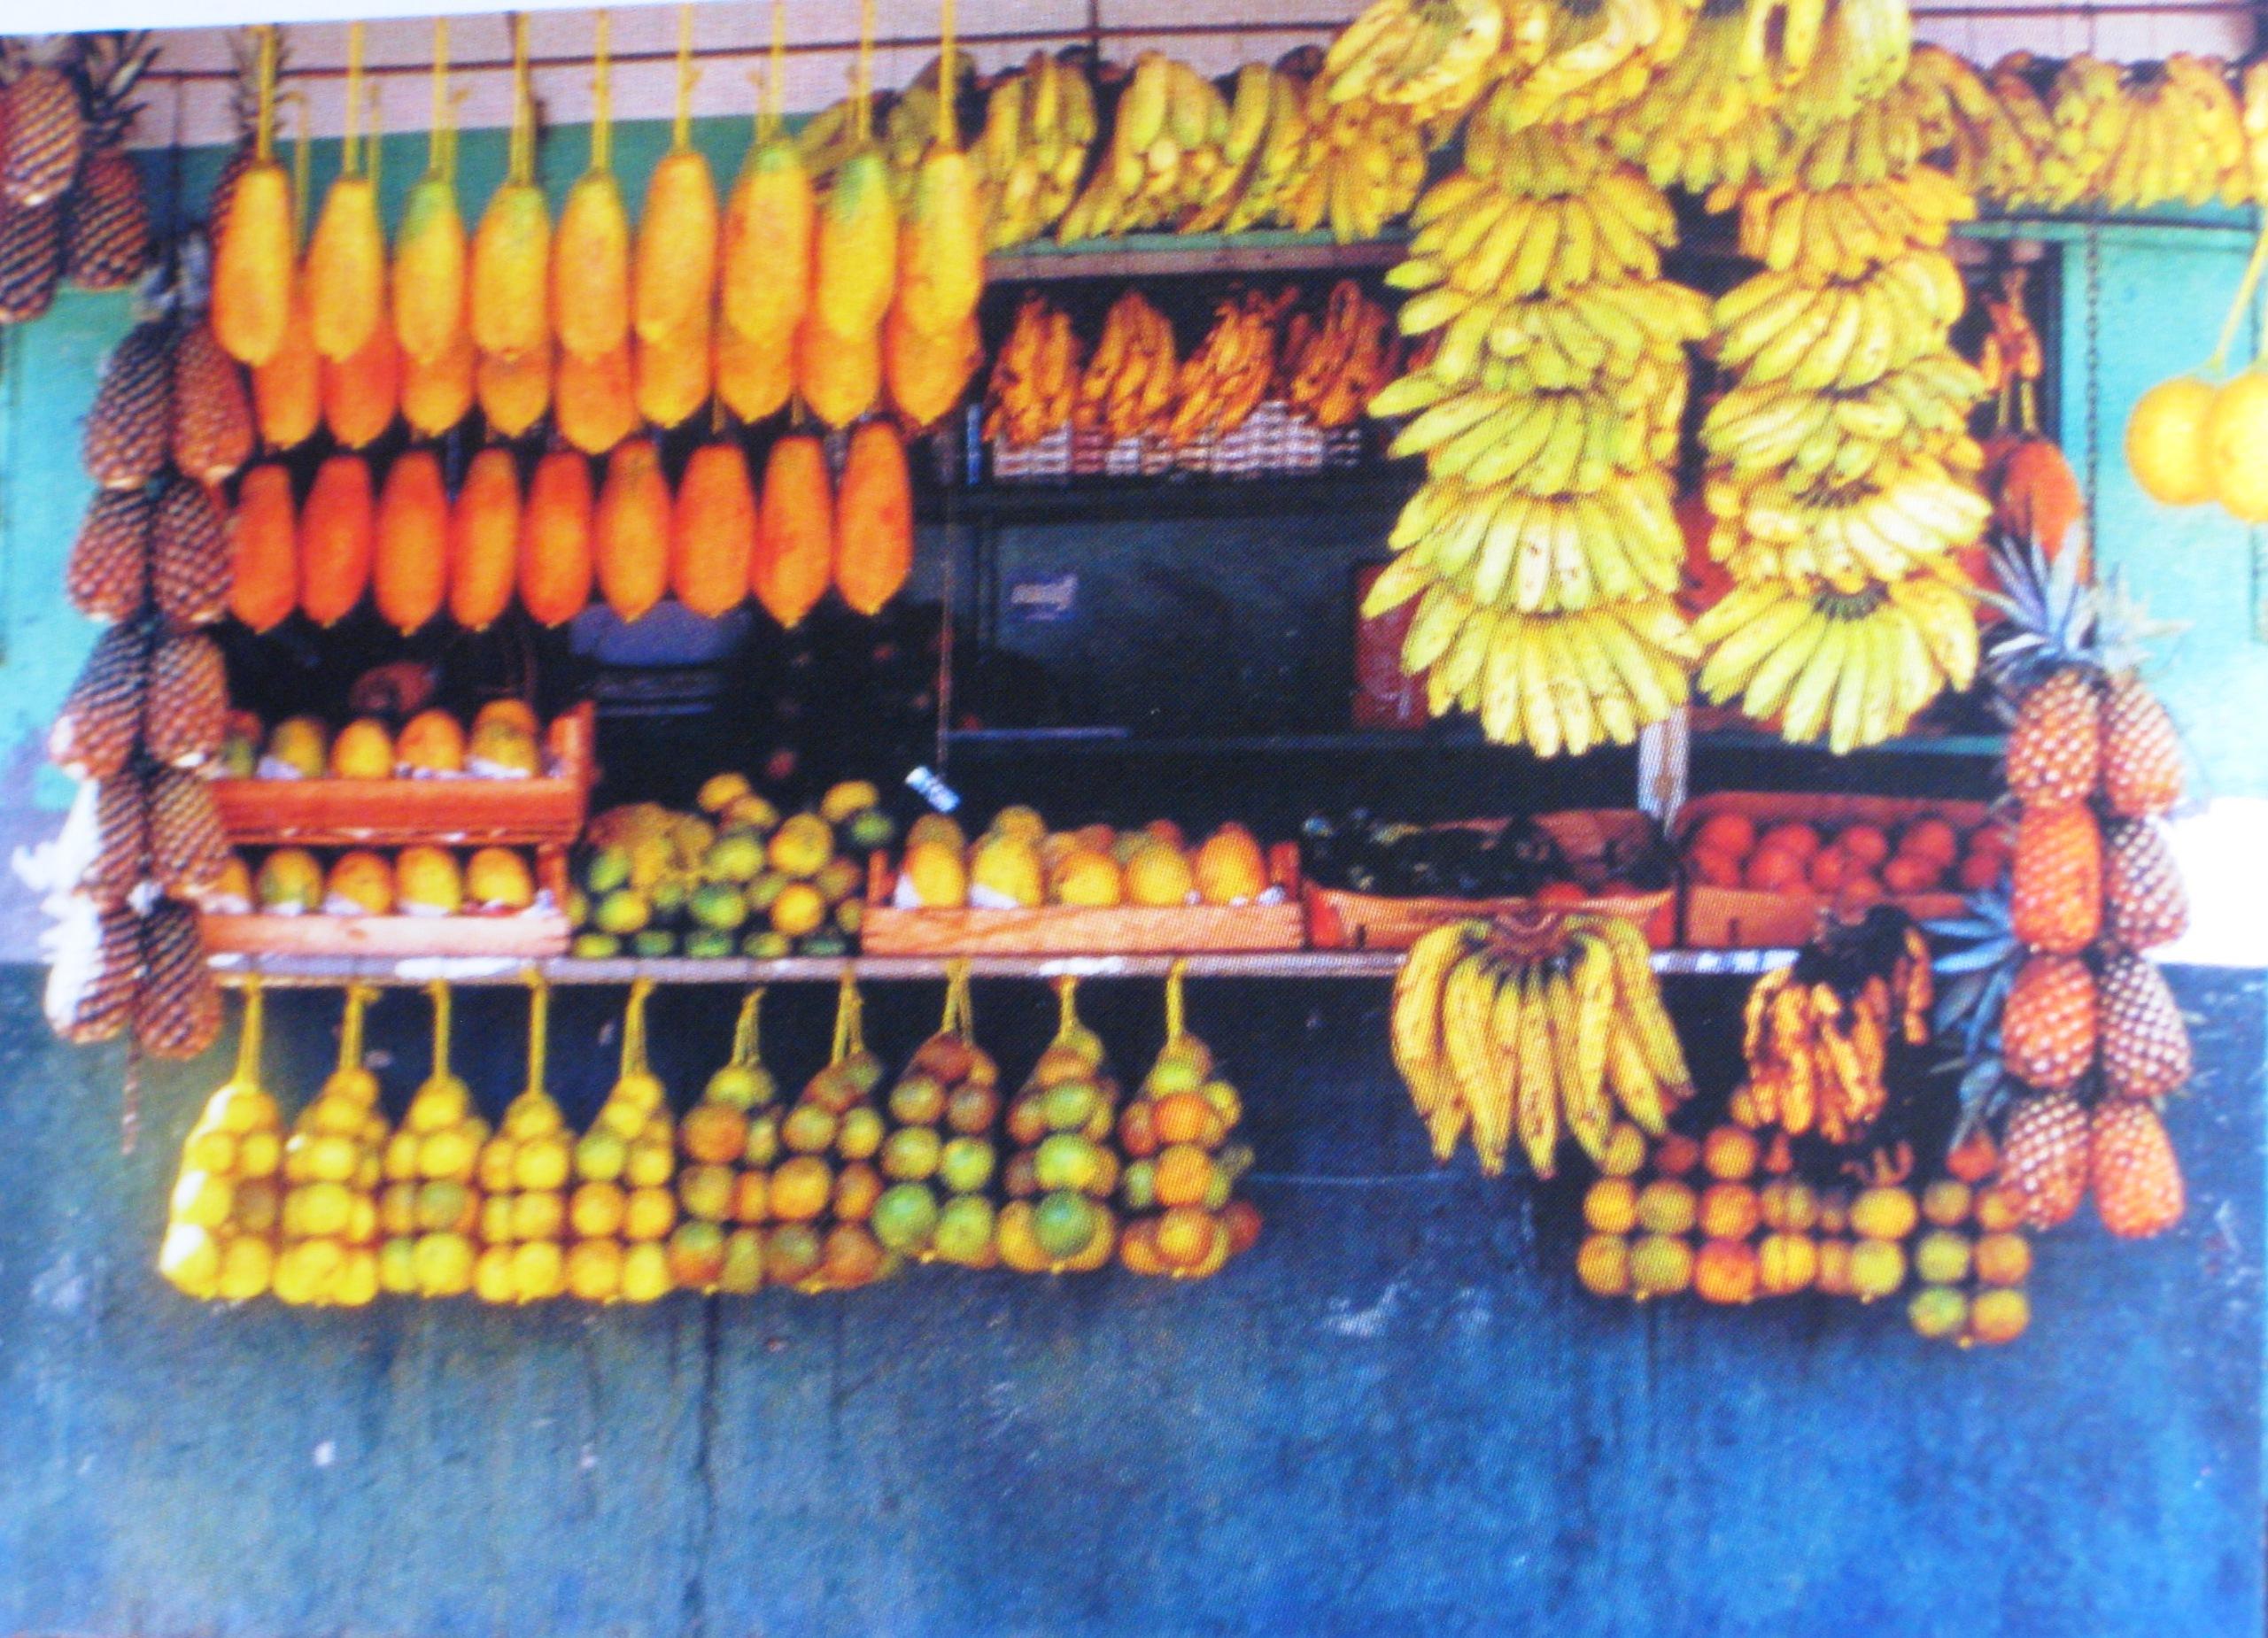 Roadside fruit stall - Aguas Calientes